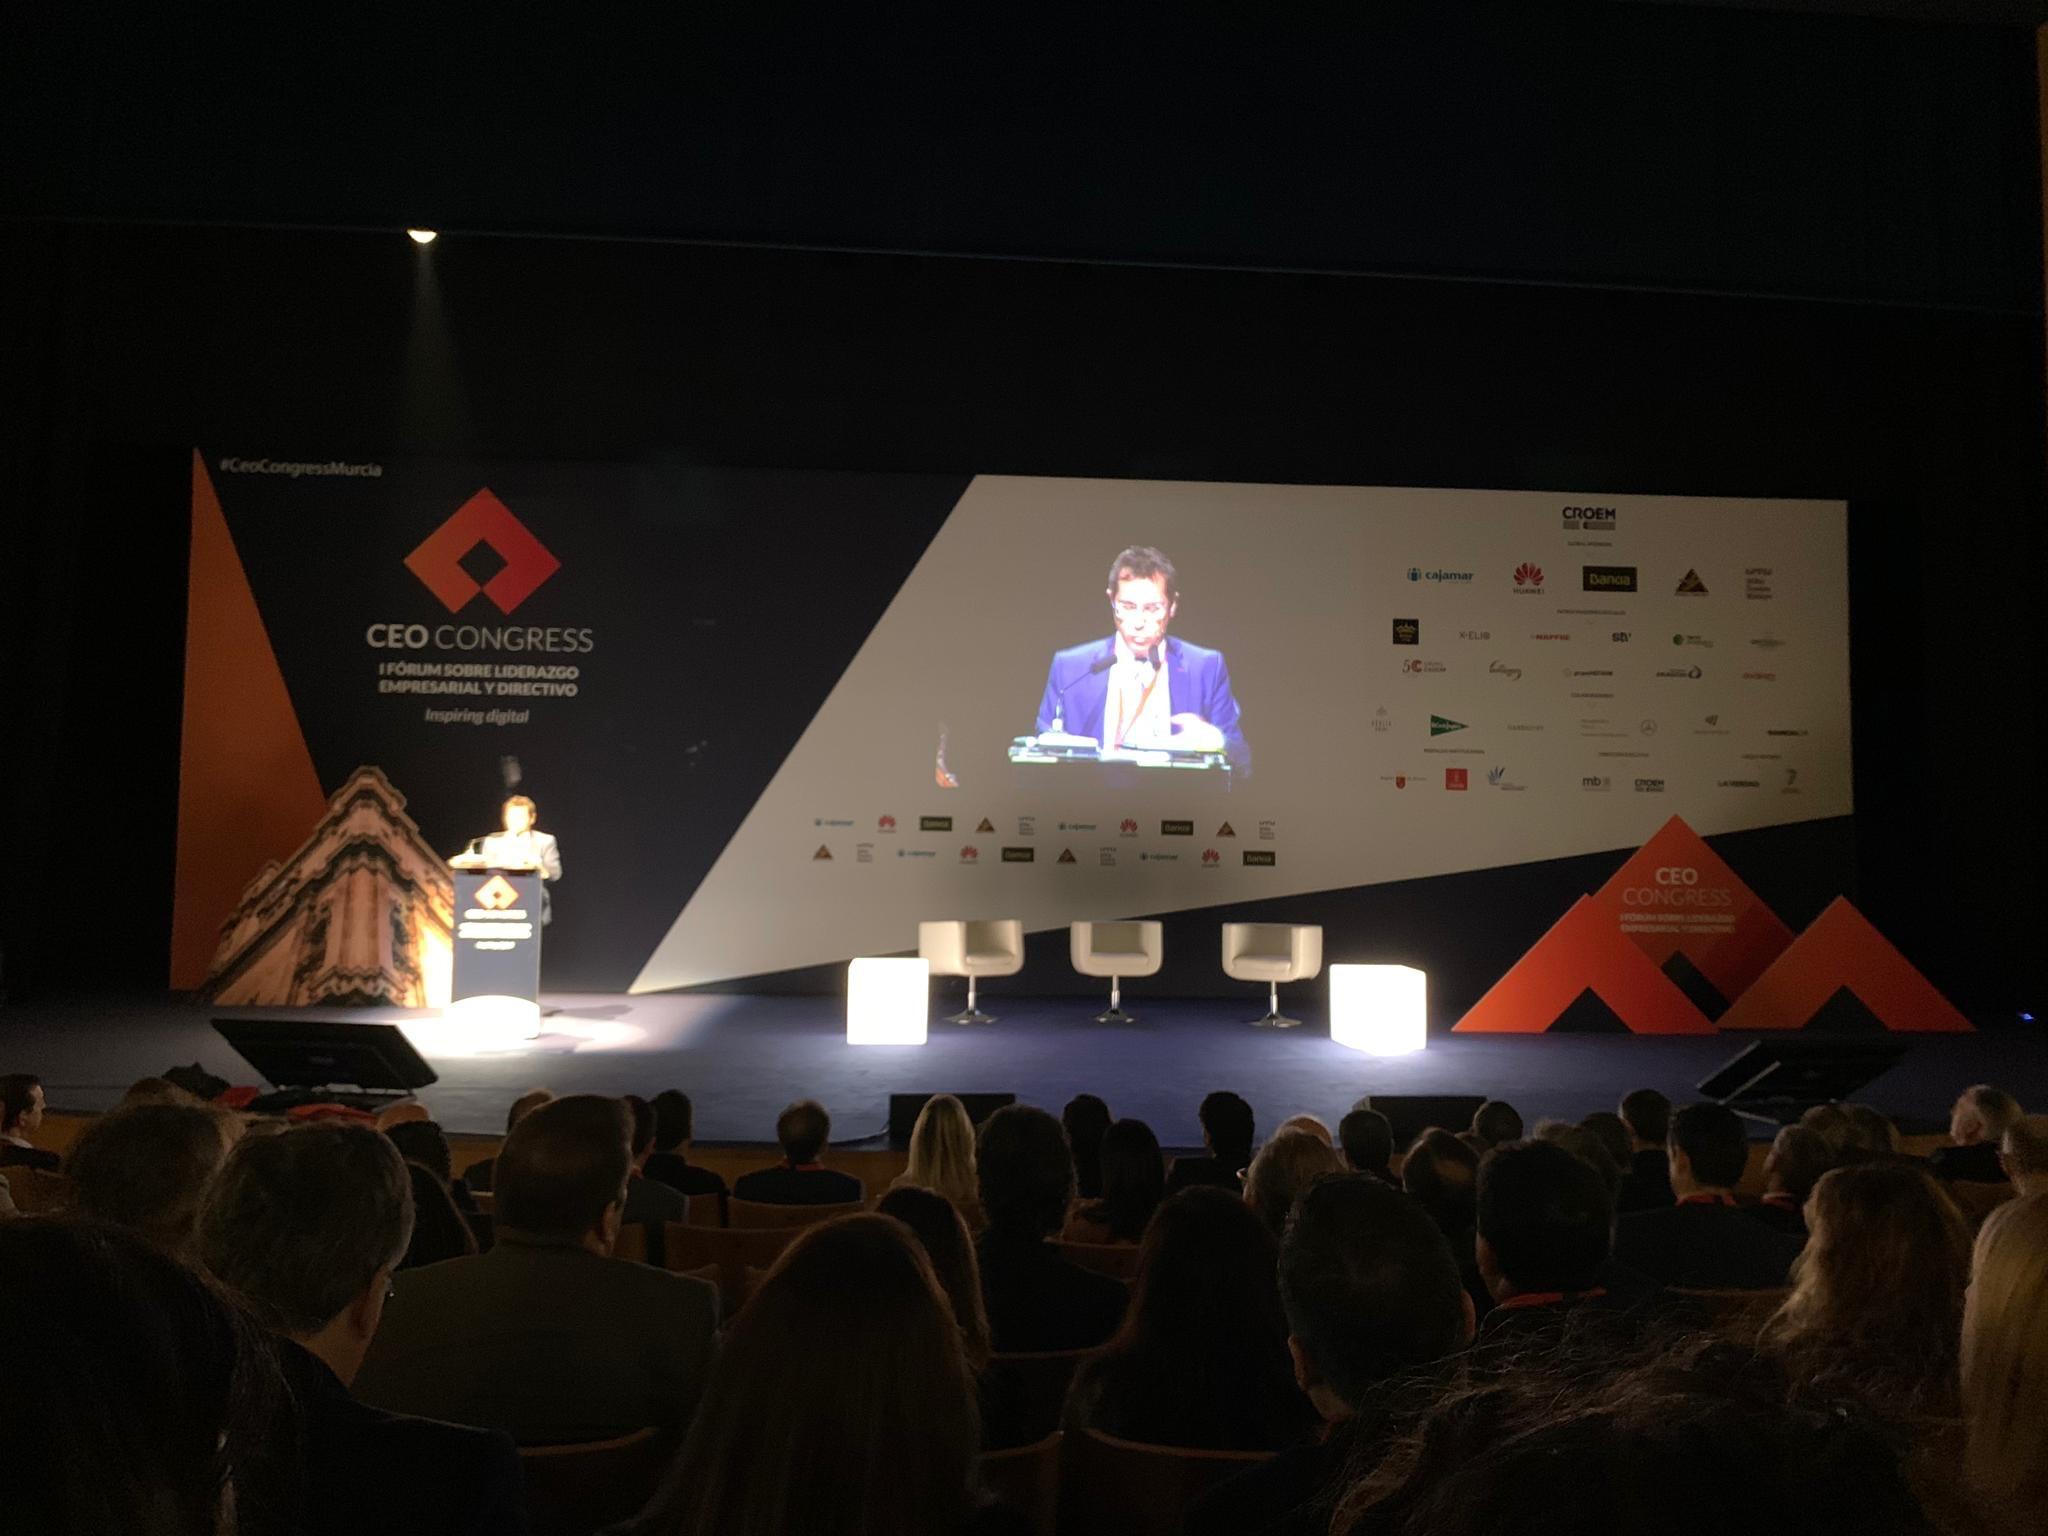 CEO Congress Forum